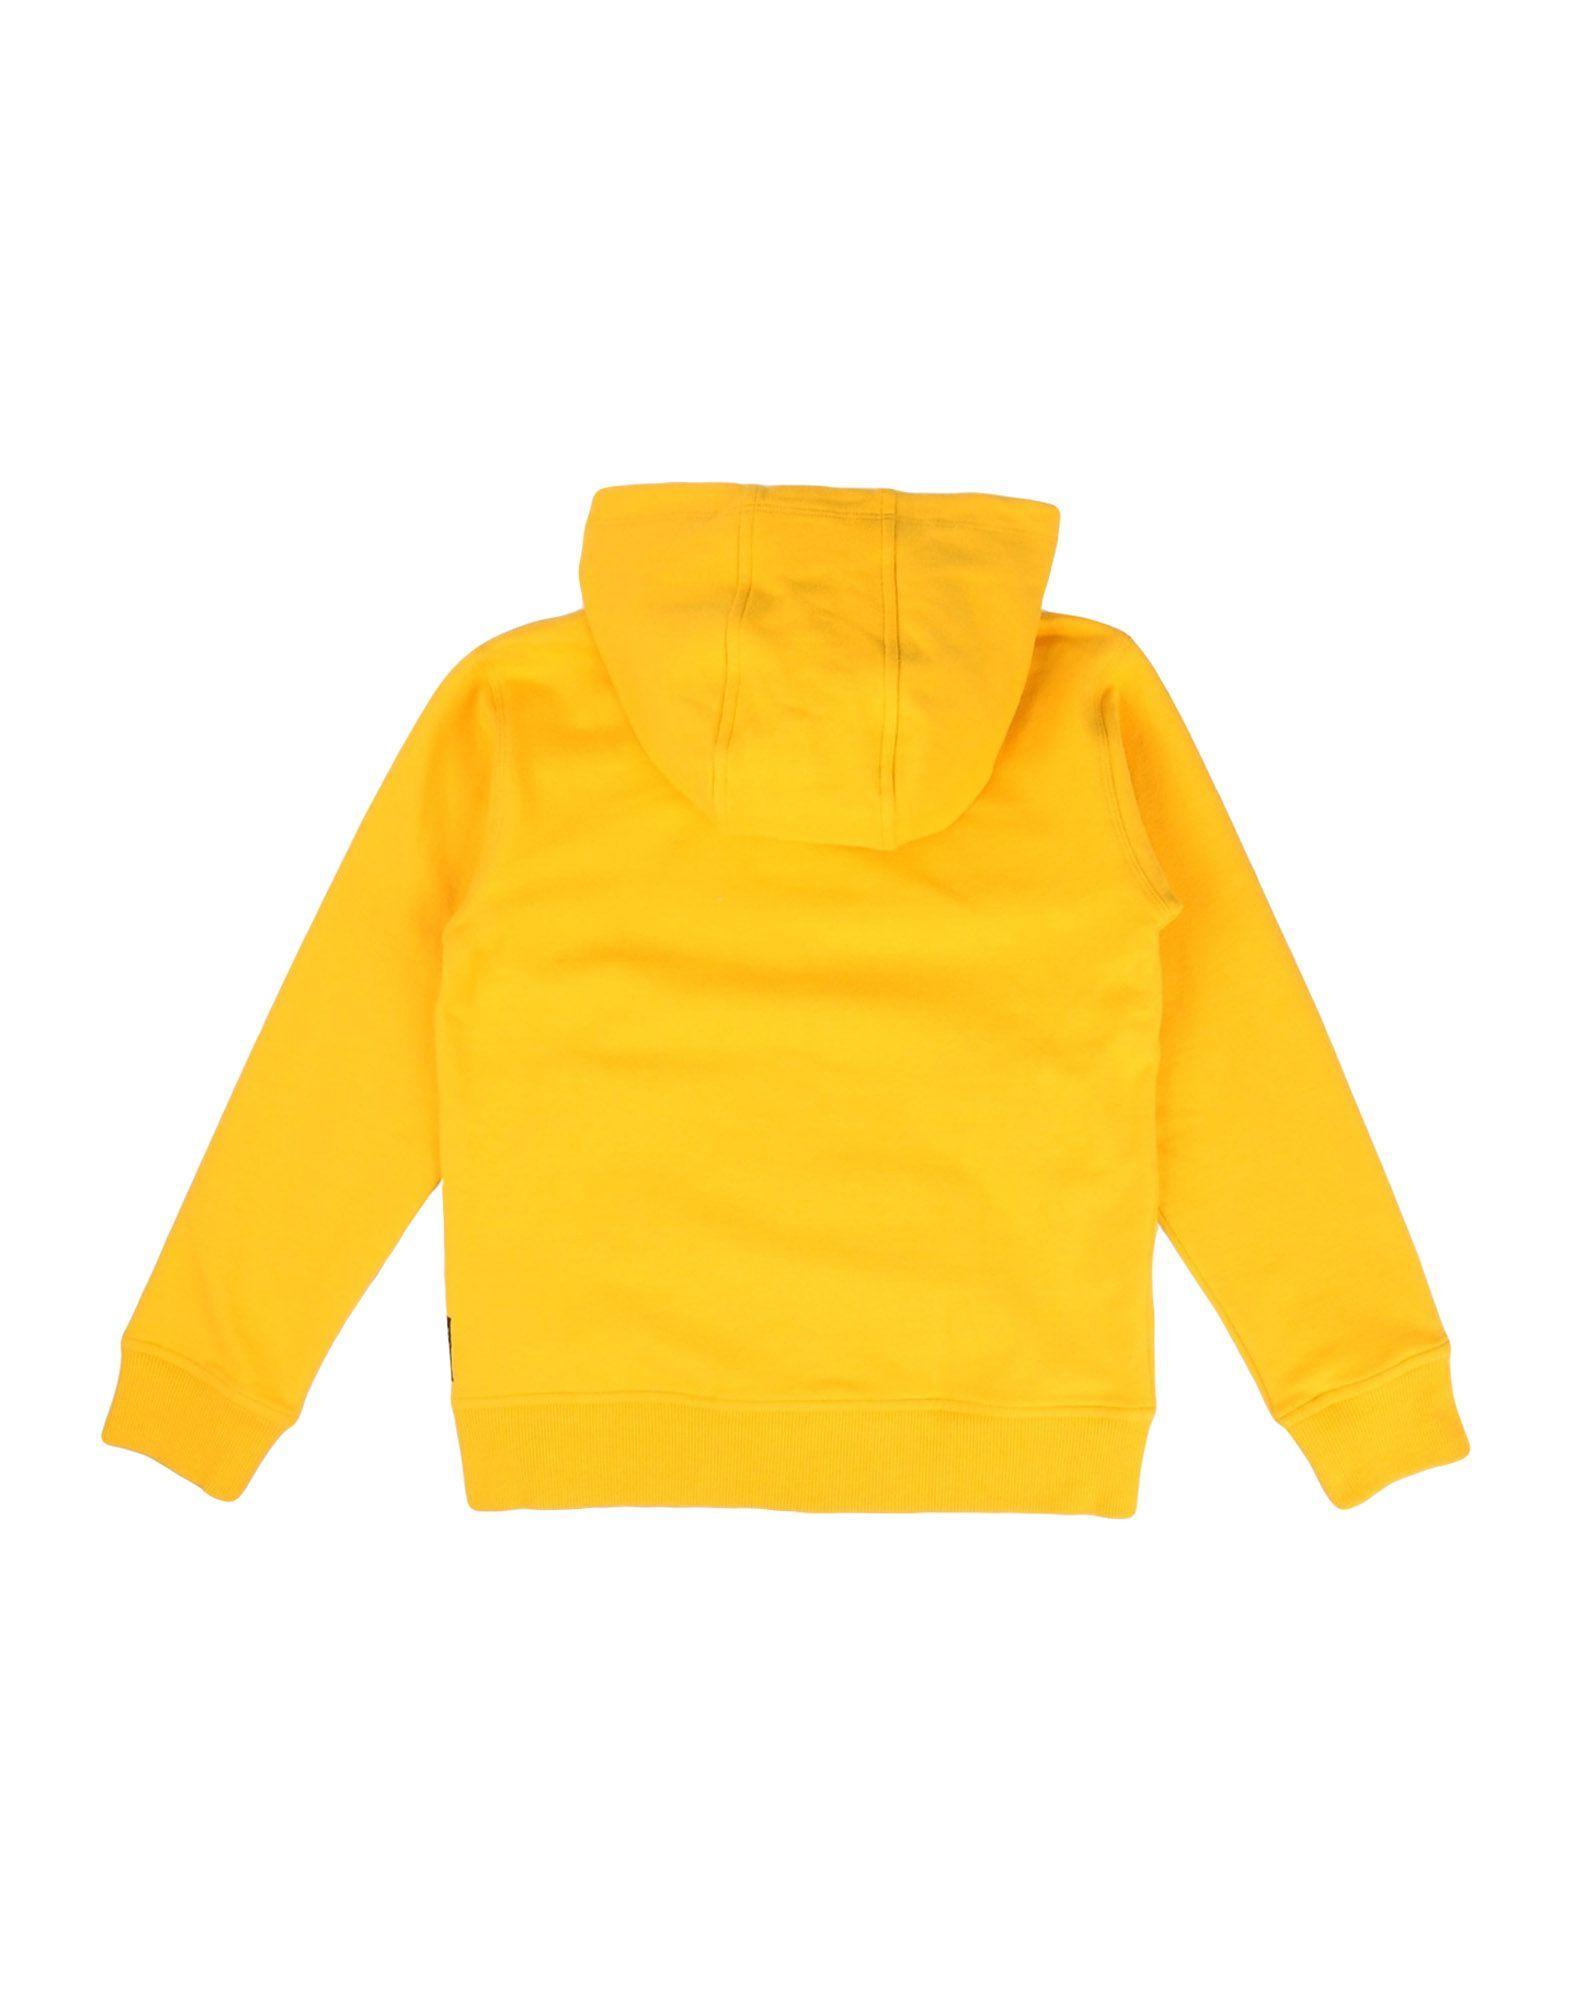 TOPWEAR Armani Junior Yellow Boy Cotton